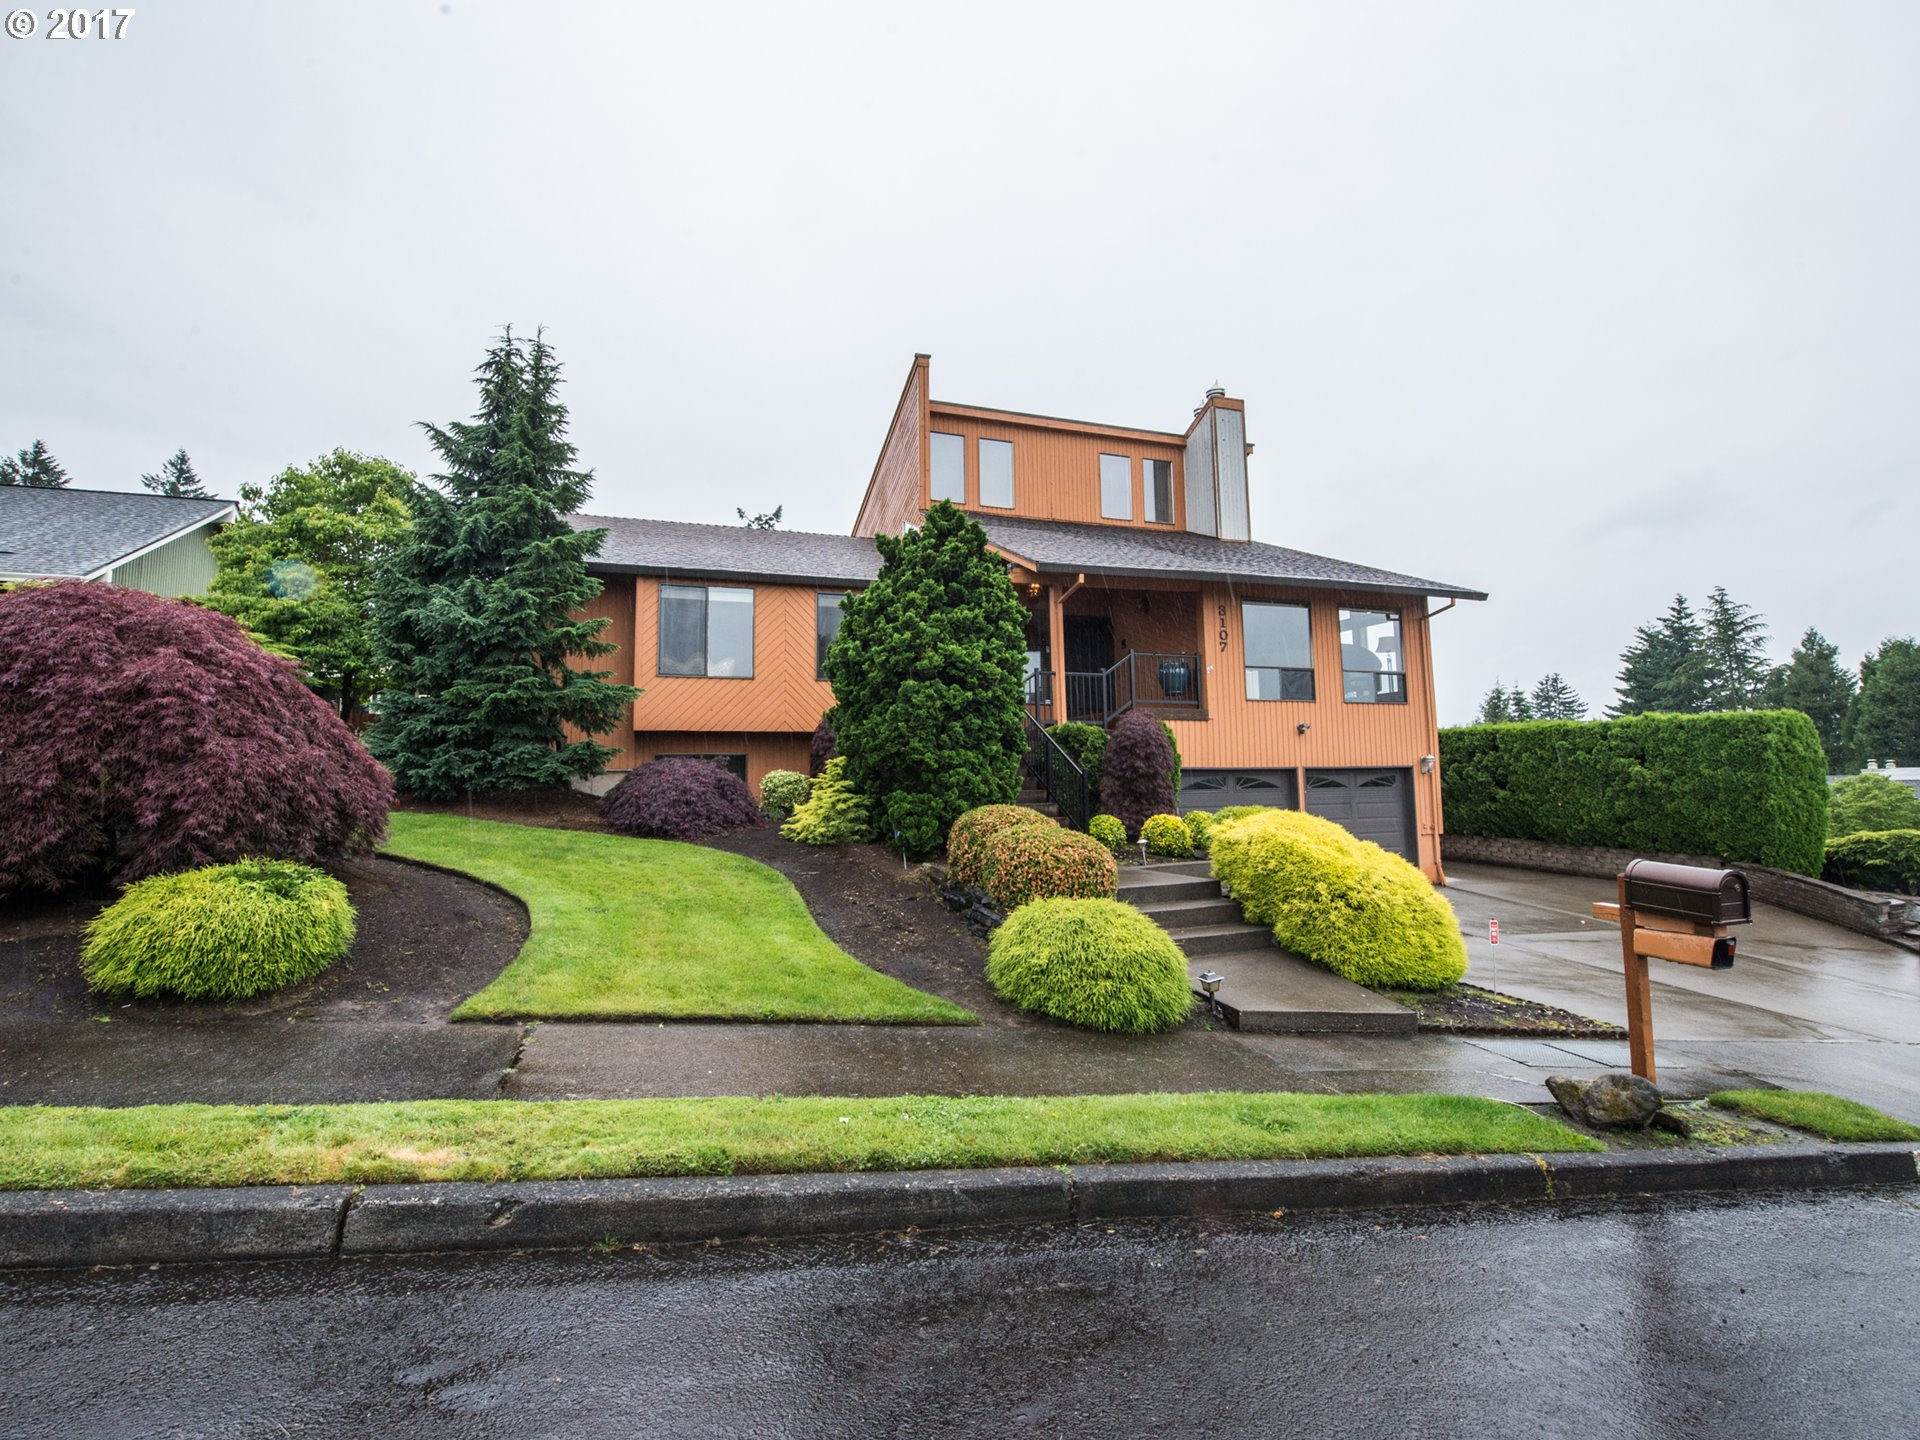 3107 NE 158TH AVE Portland, OR 97230 - MLS #: 17634867